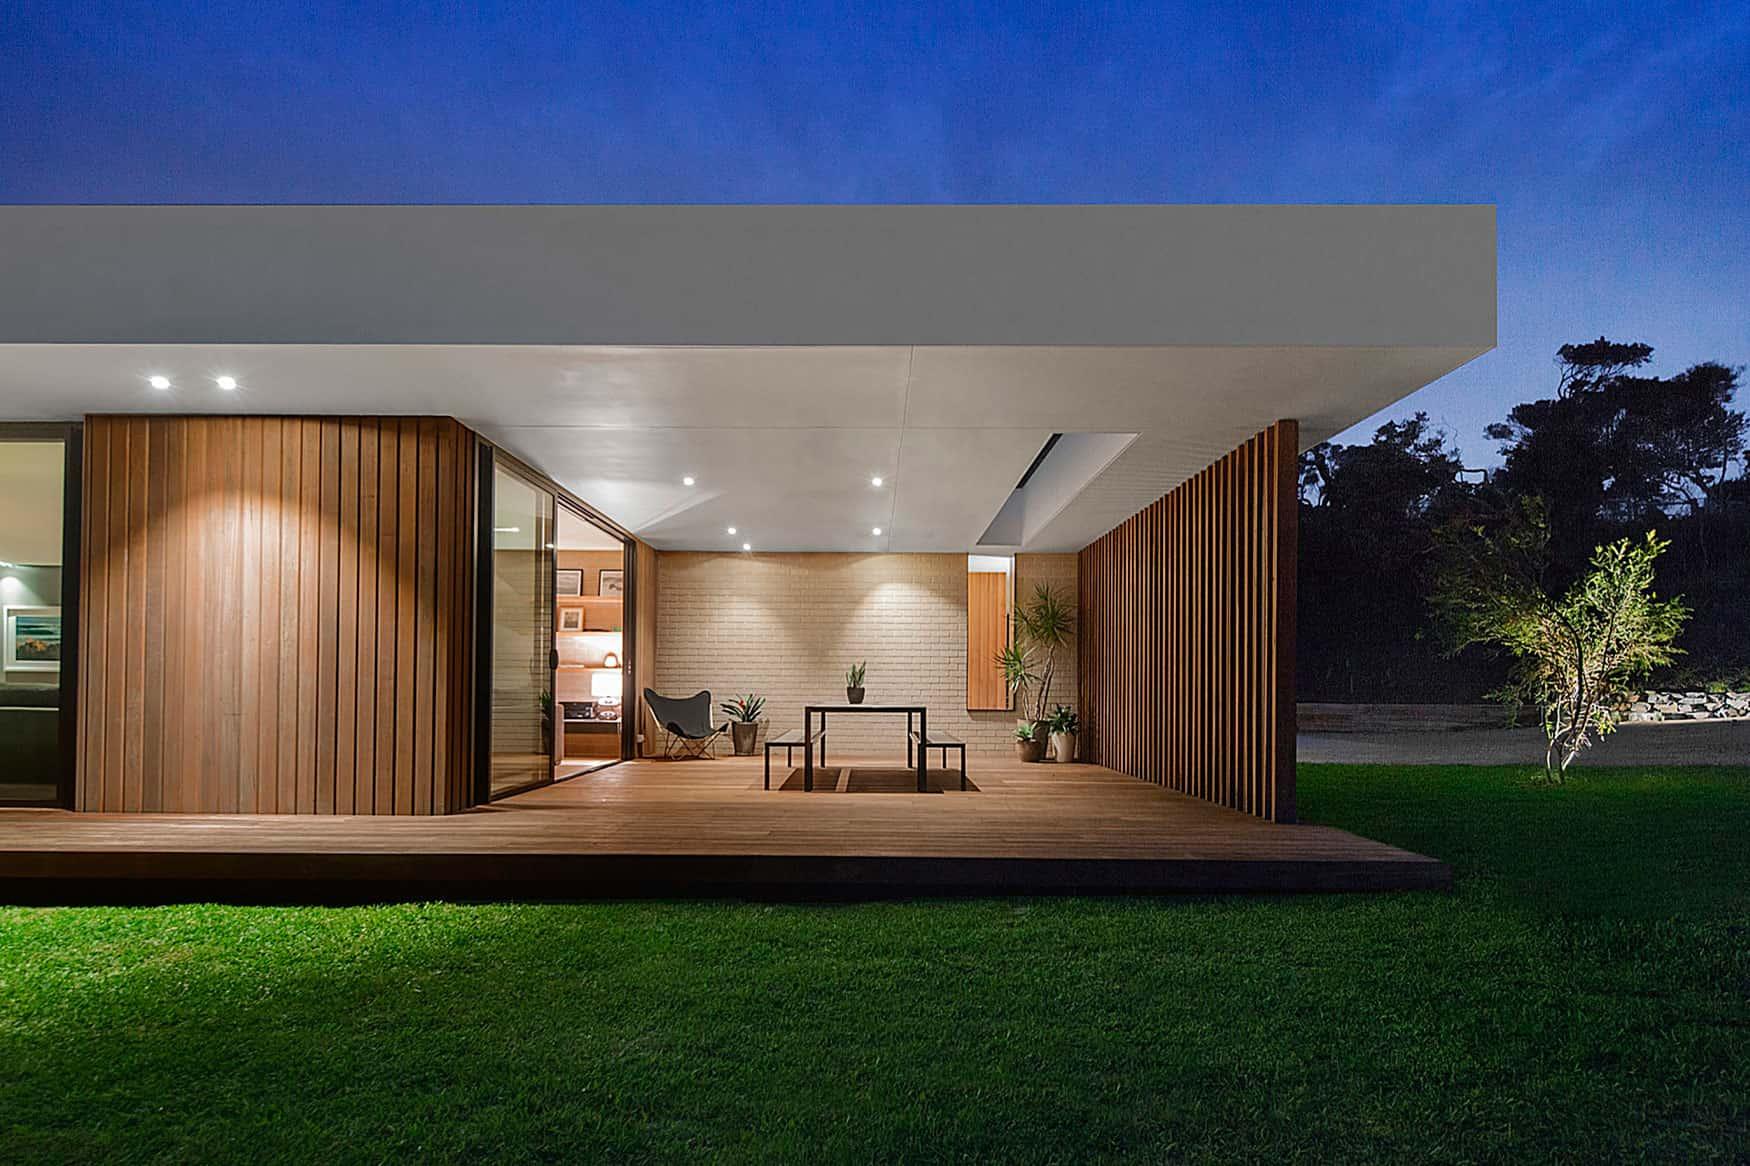 Inform design a timber and glass pavilion in australia for Pavillion home designs australia